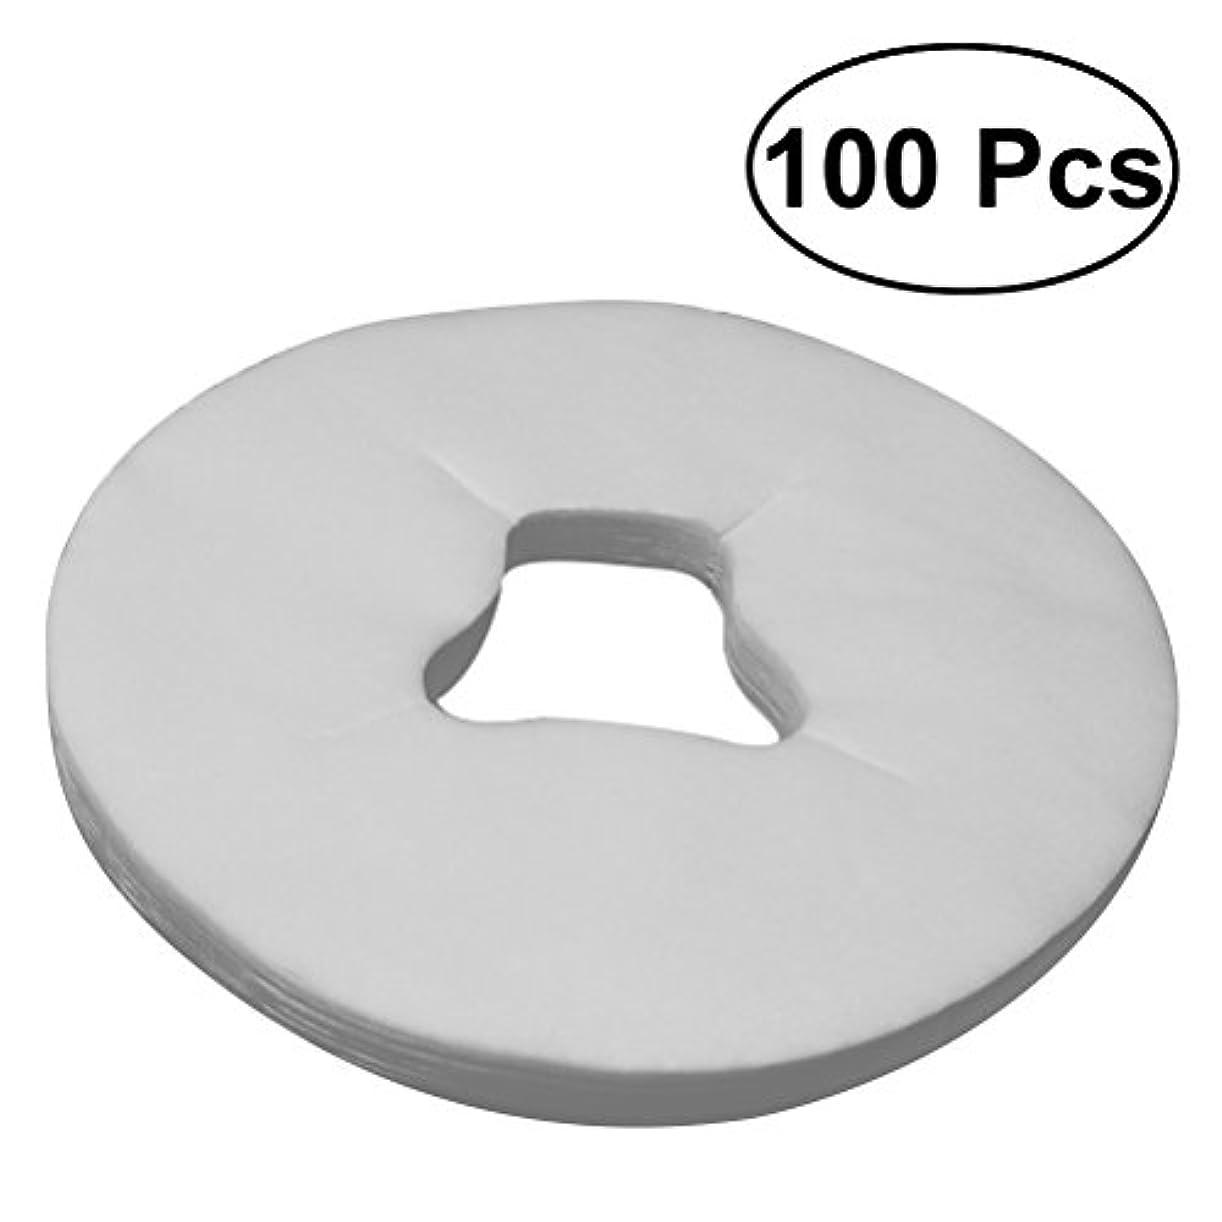 ULTNICE マッサージテーブル用100PCSディスポーザブルフェイスレストカバー